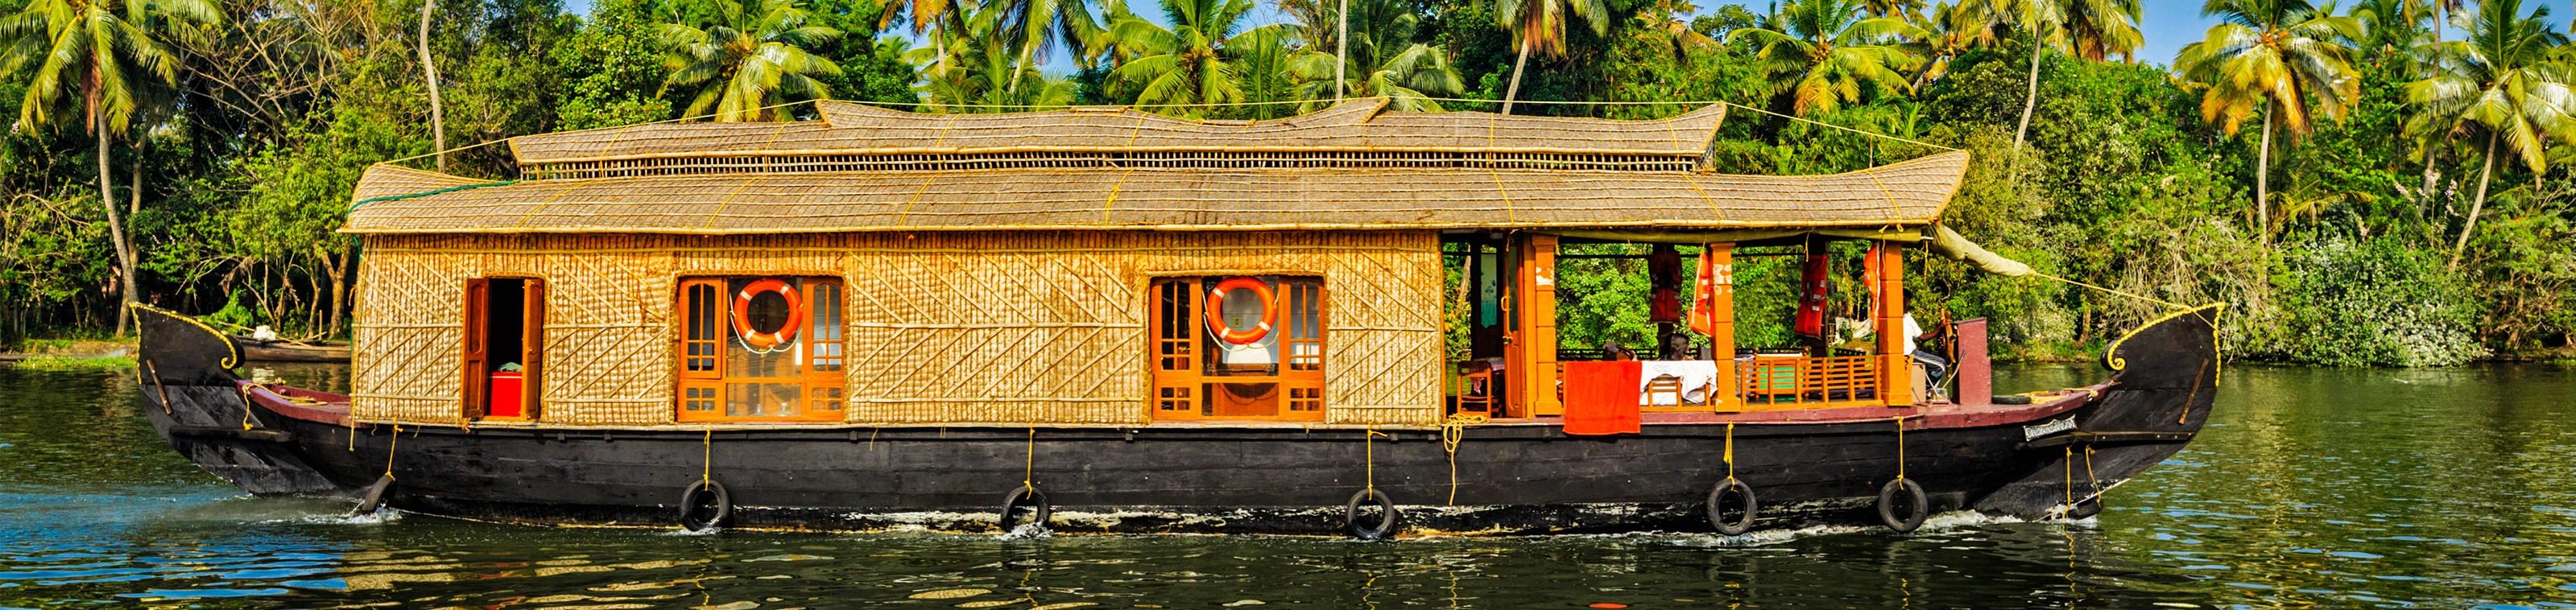 Herbronnen in Kerala